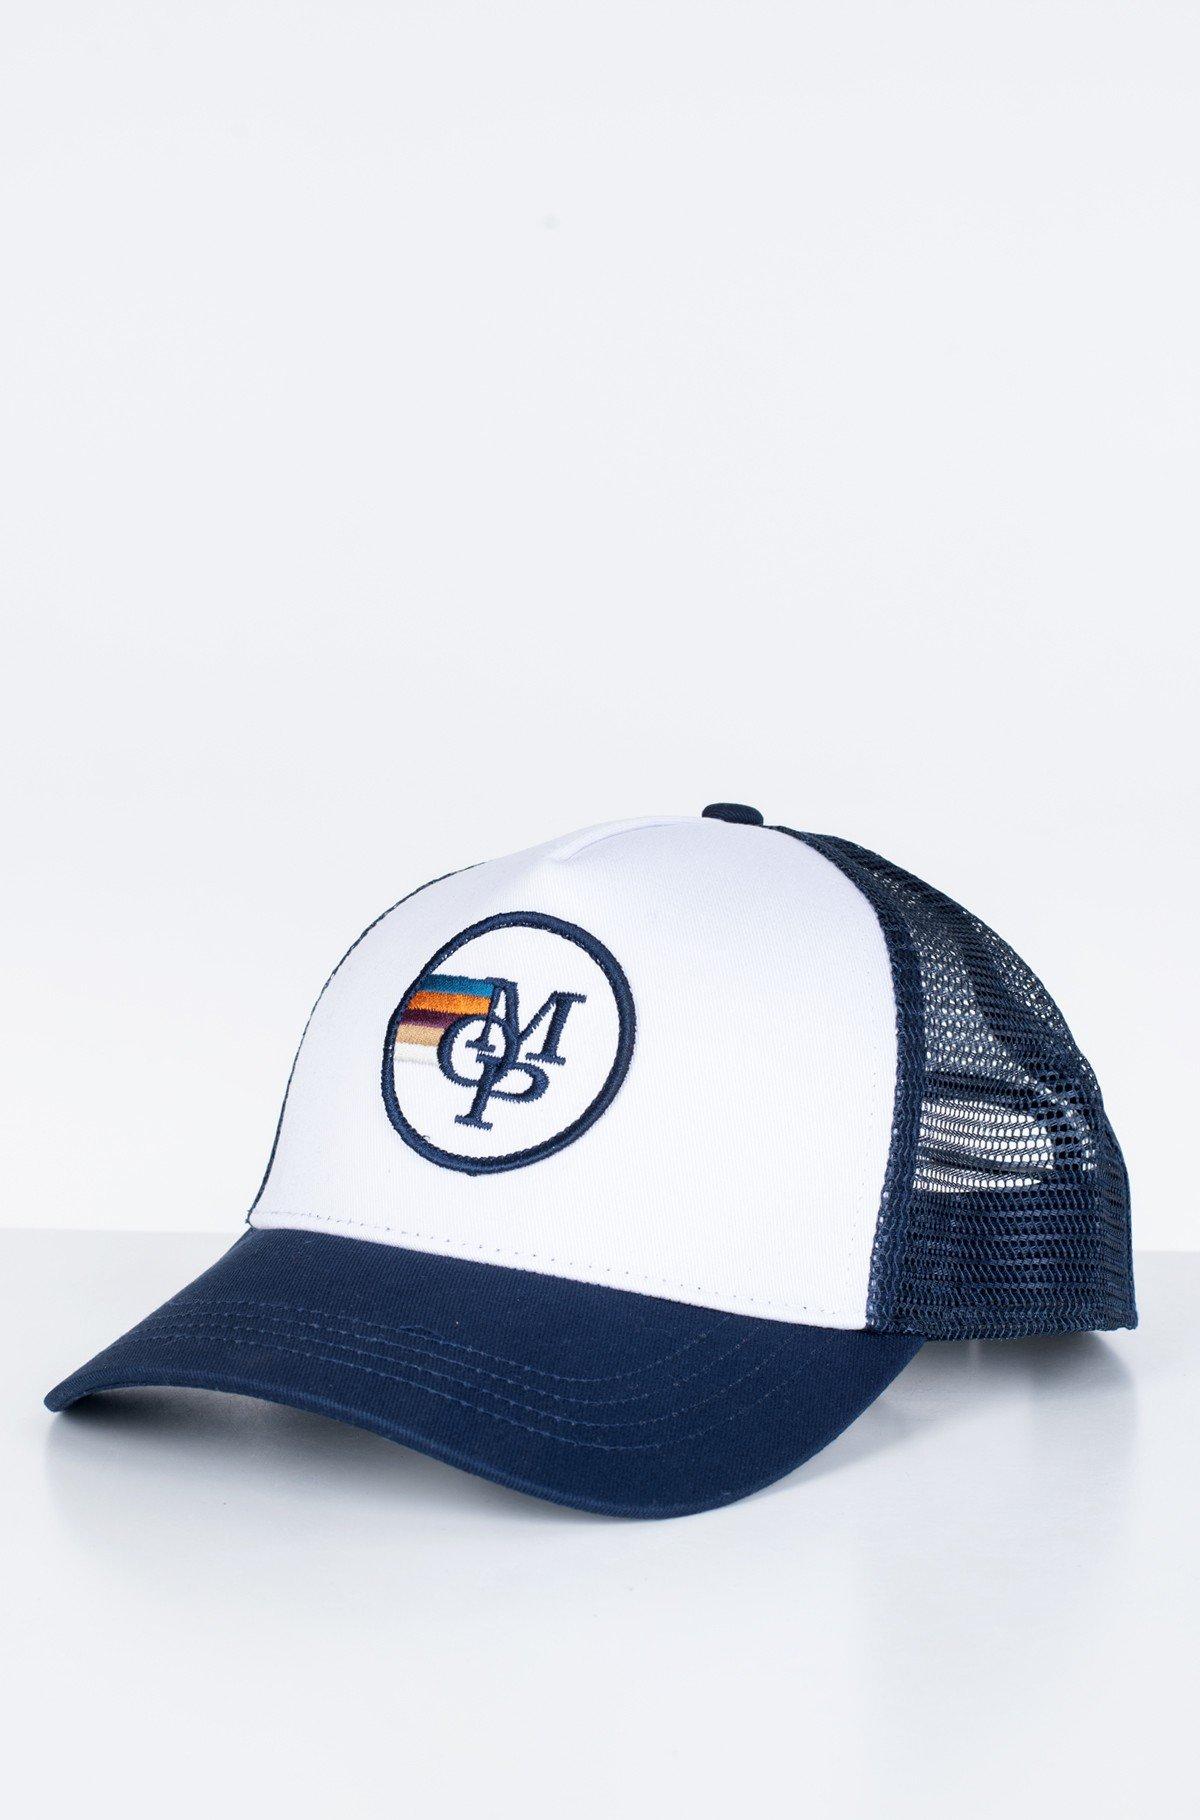 Kepurė su snapeliu  026 8032 01040-full-2